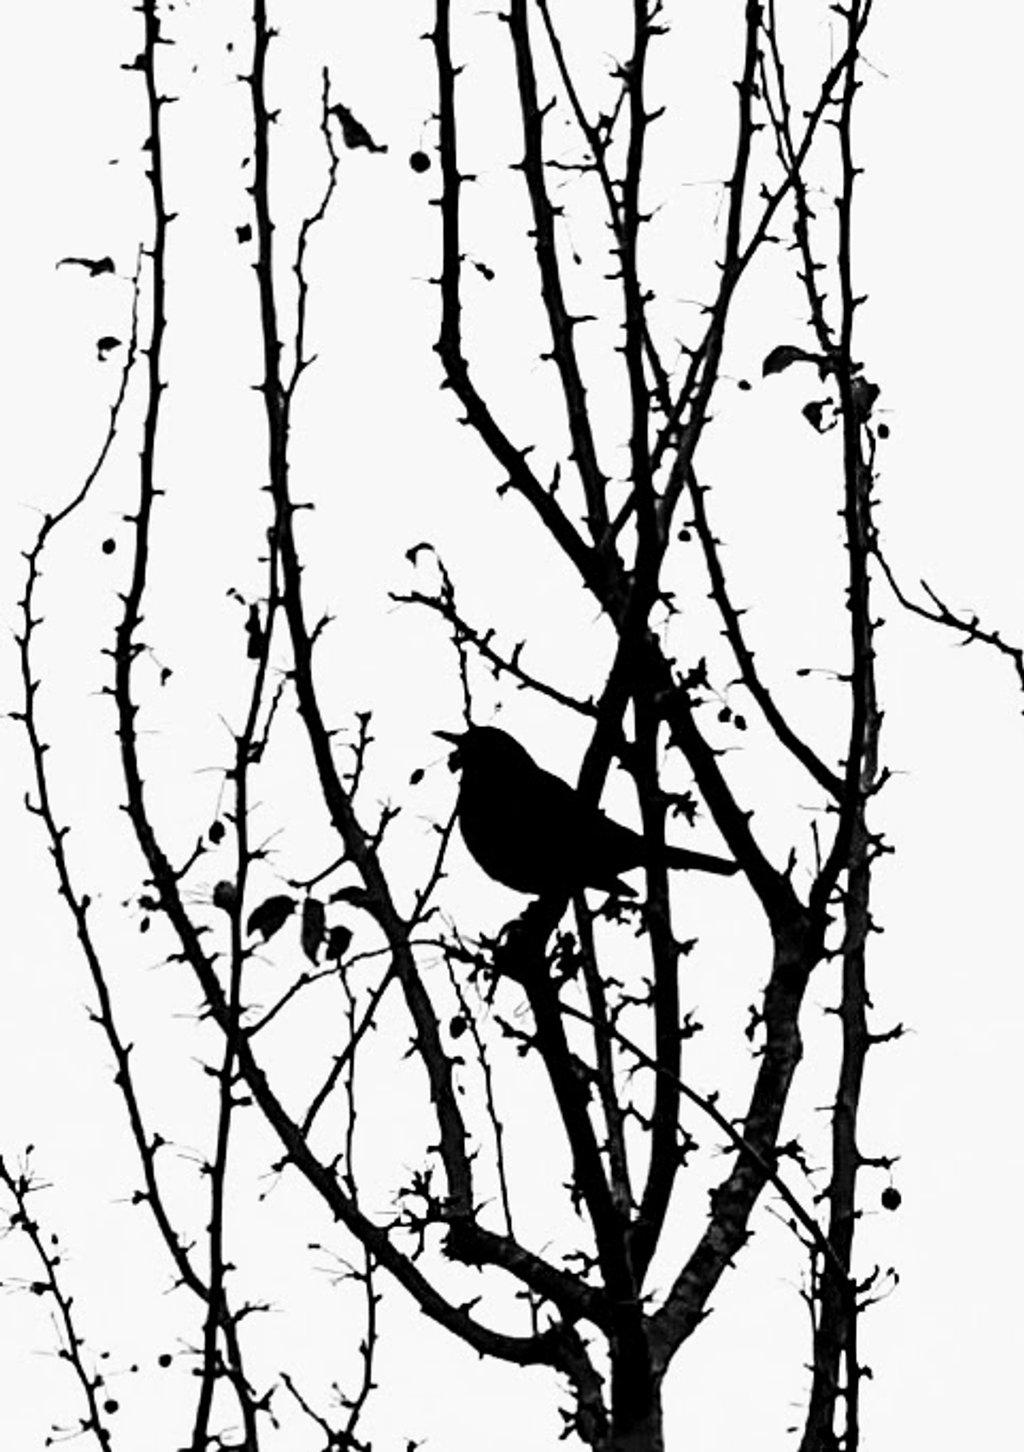 Blackbird by 4rky